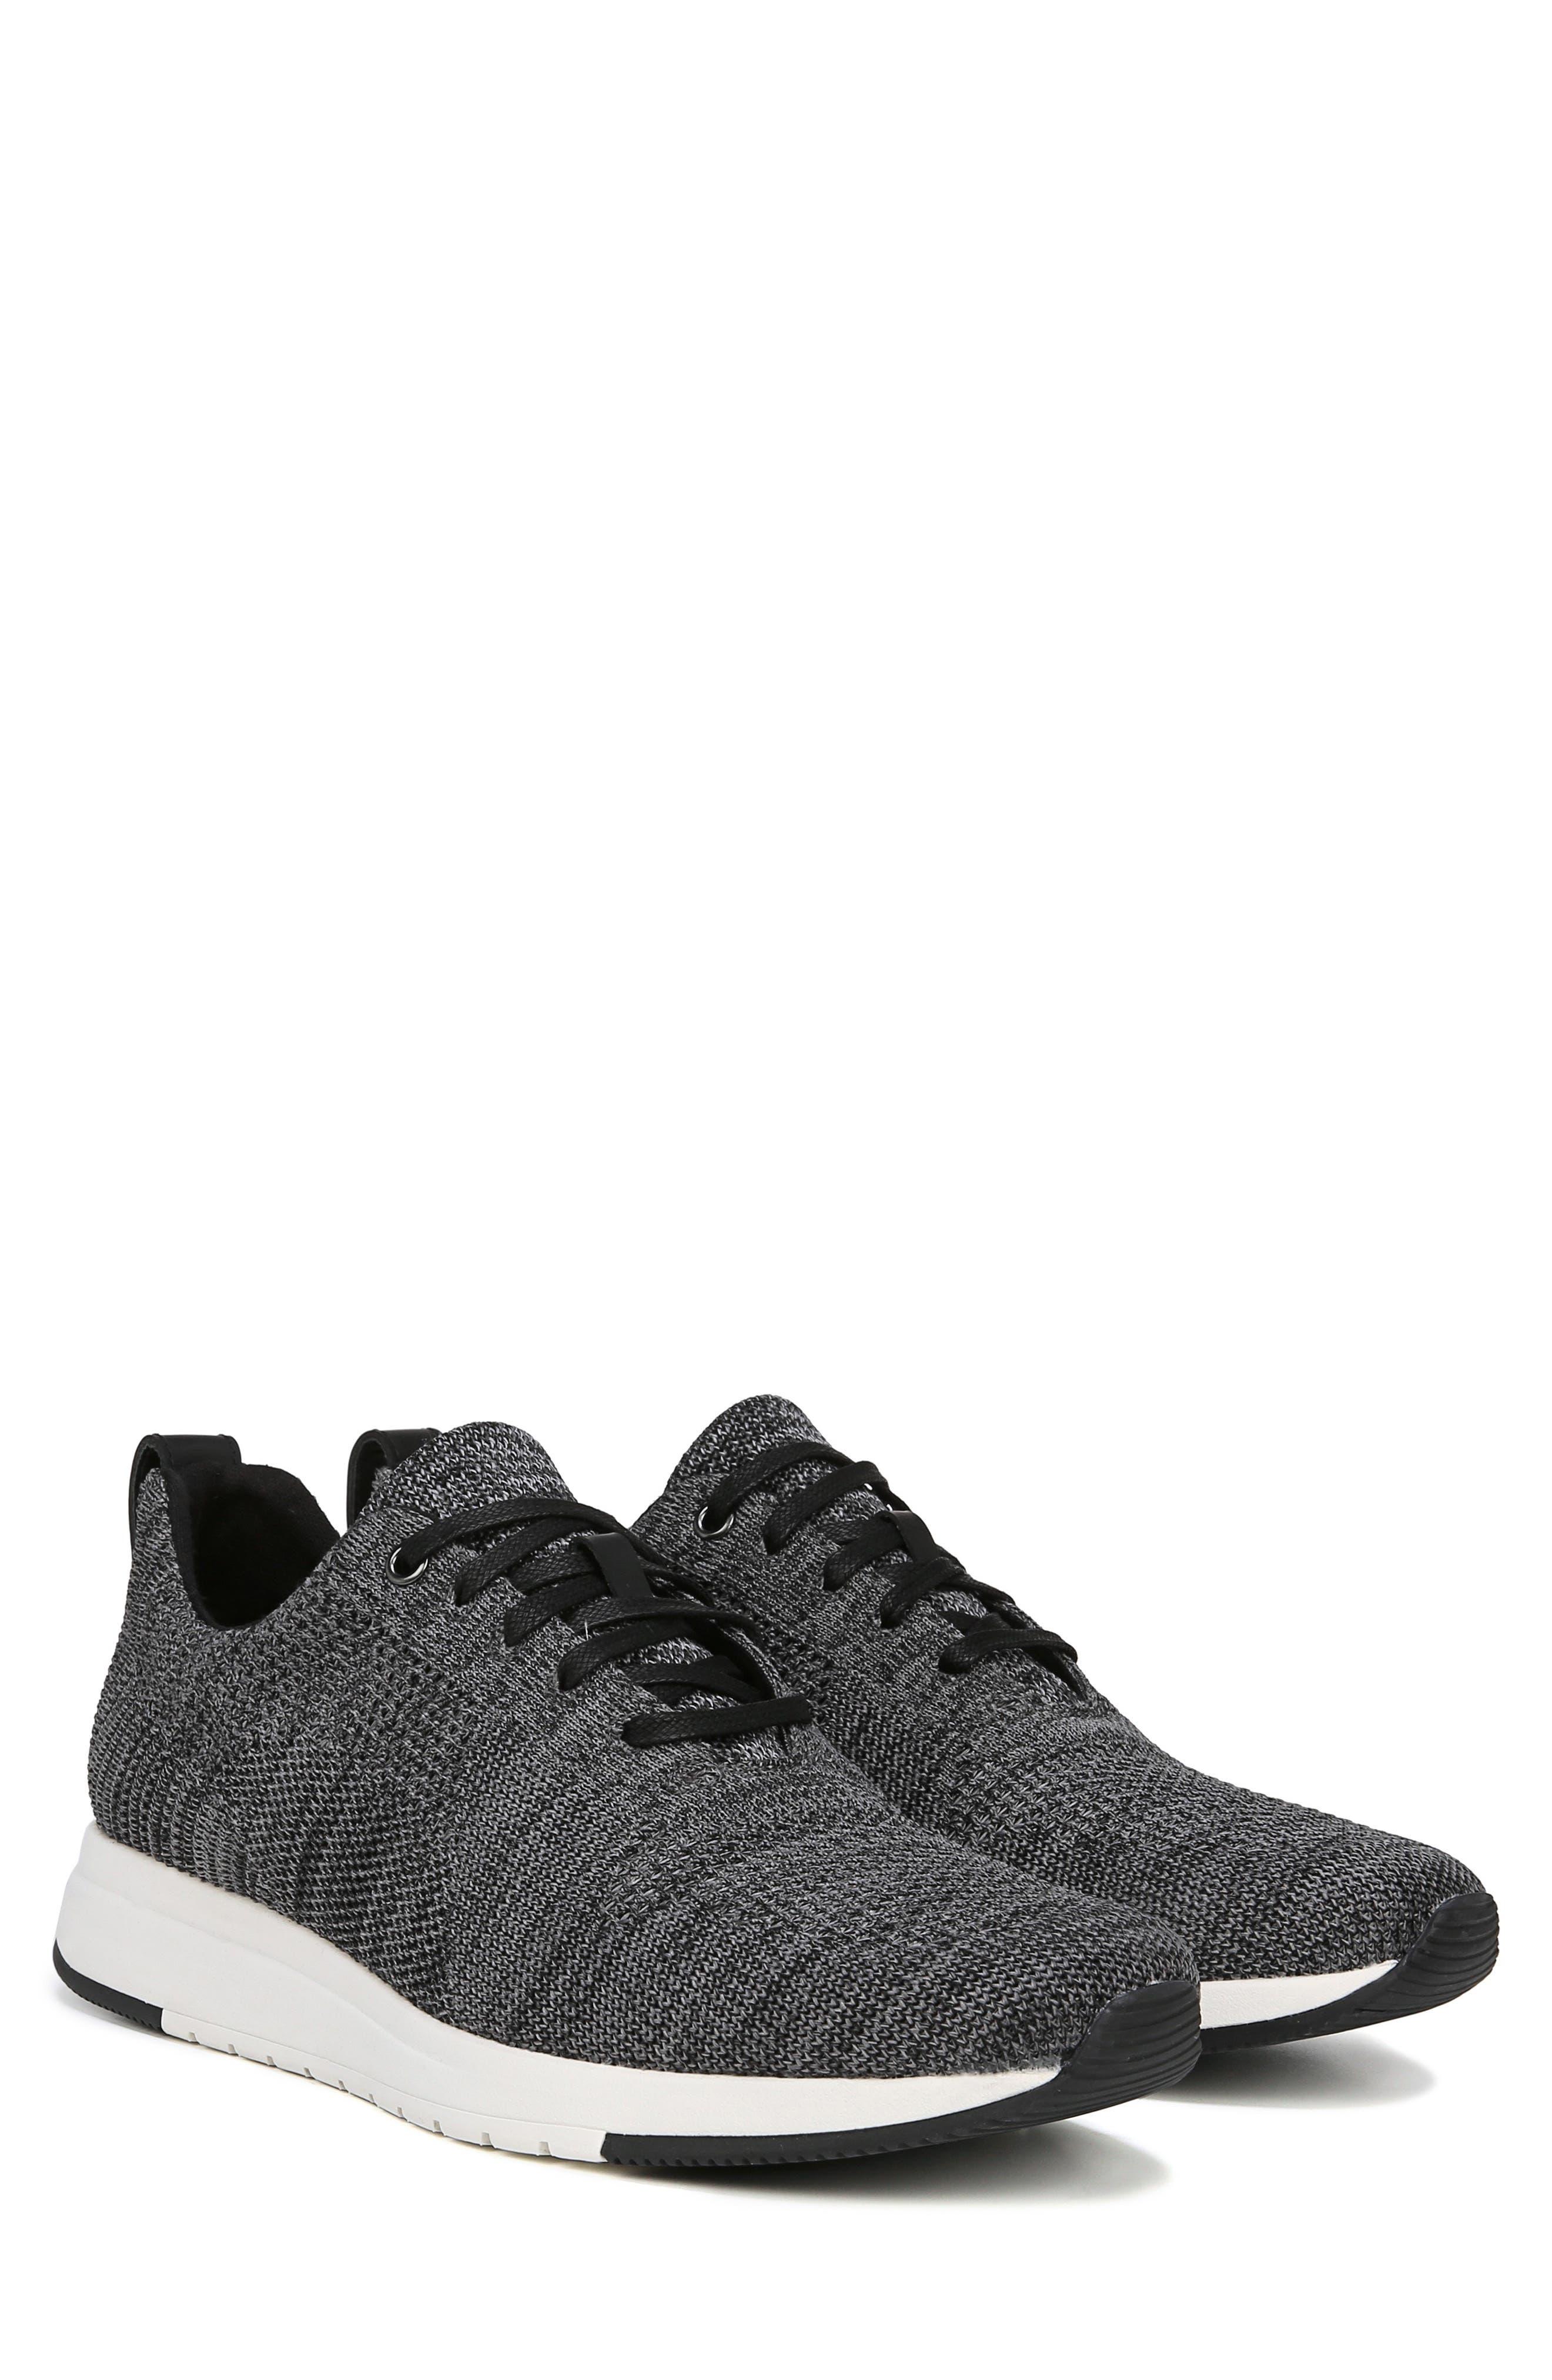 Palo Knit Sneaker,                             Alternate thumbnail 9, color,                             MARL GREY/ BLACK